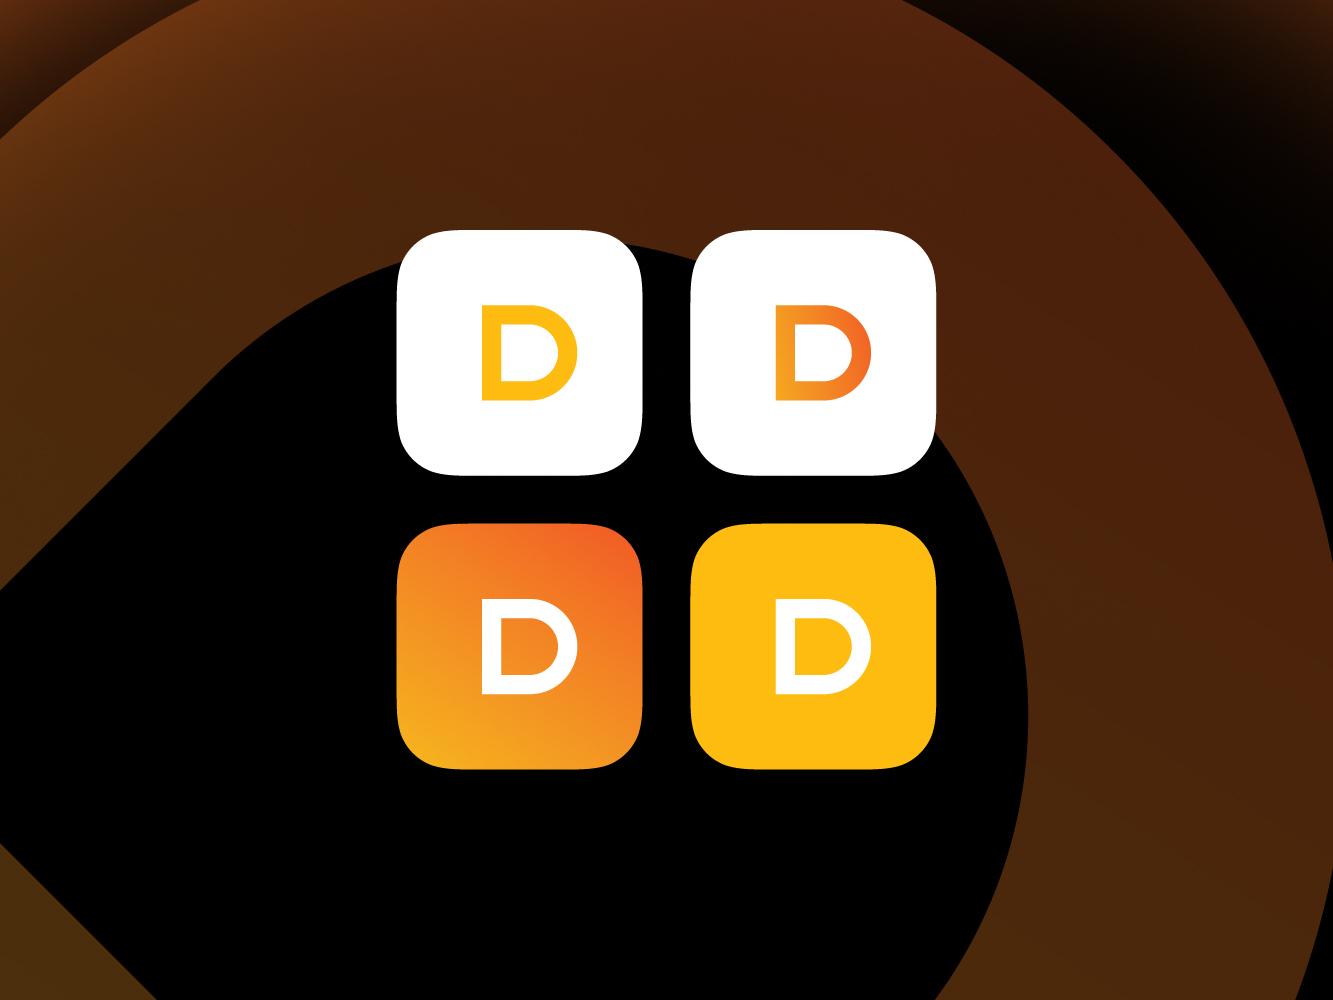 App Icon concept For DAPP brand yellow branding concept typography orange 86 b smxr illustration ecommerce clothing company clothing vector logo fashion clothing brand design branding app icon design icon app